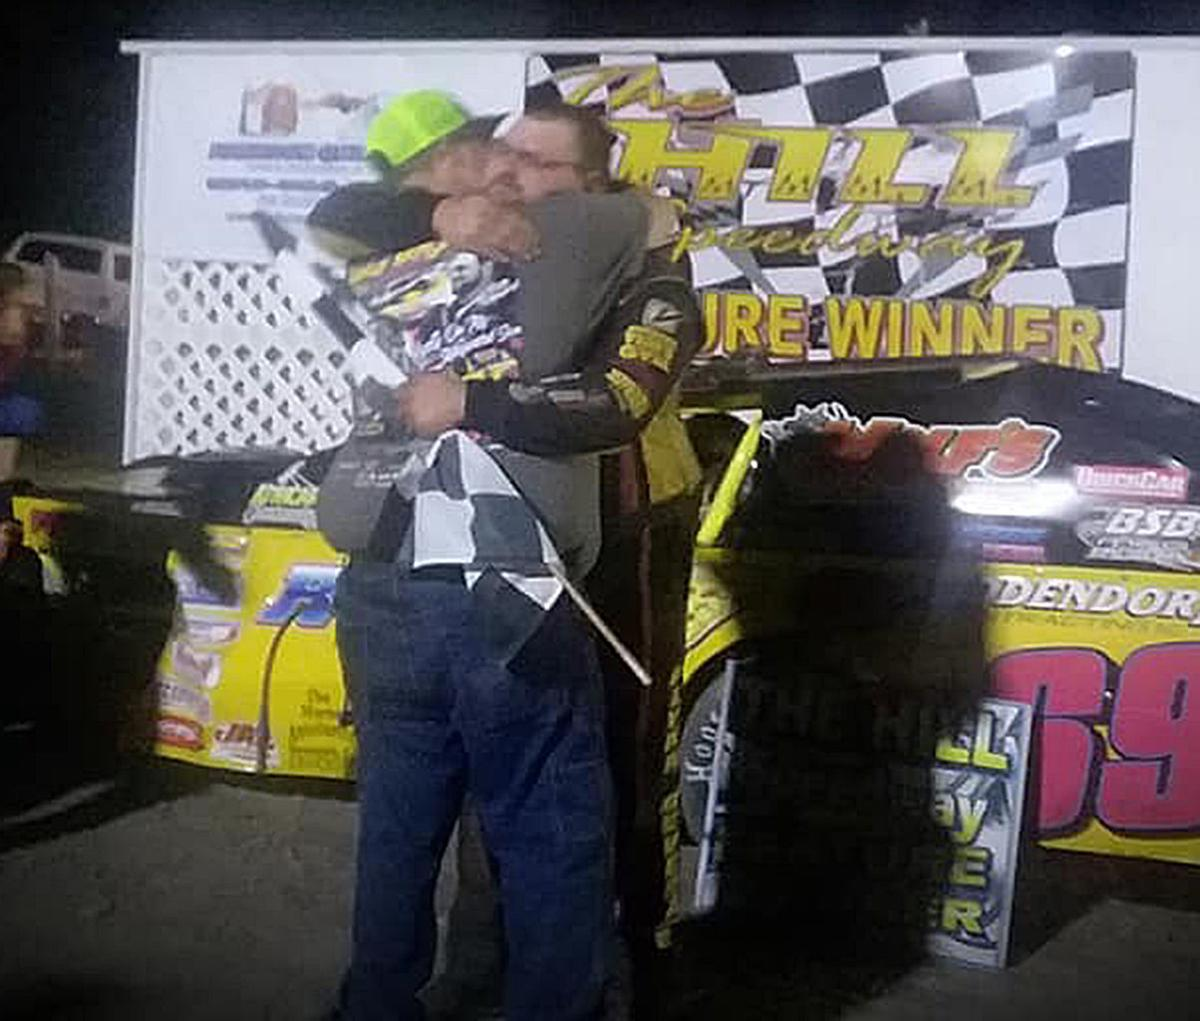 Jake Maynard scores emotional victory